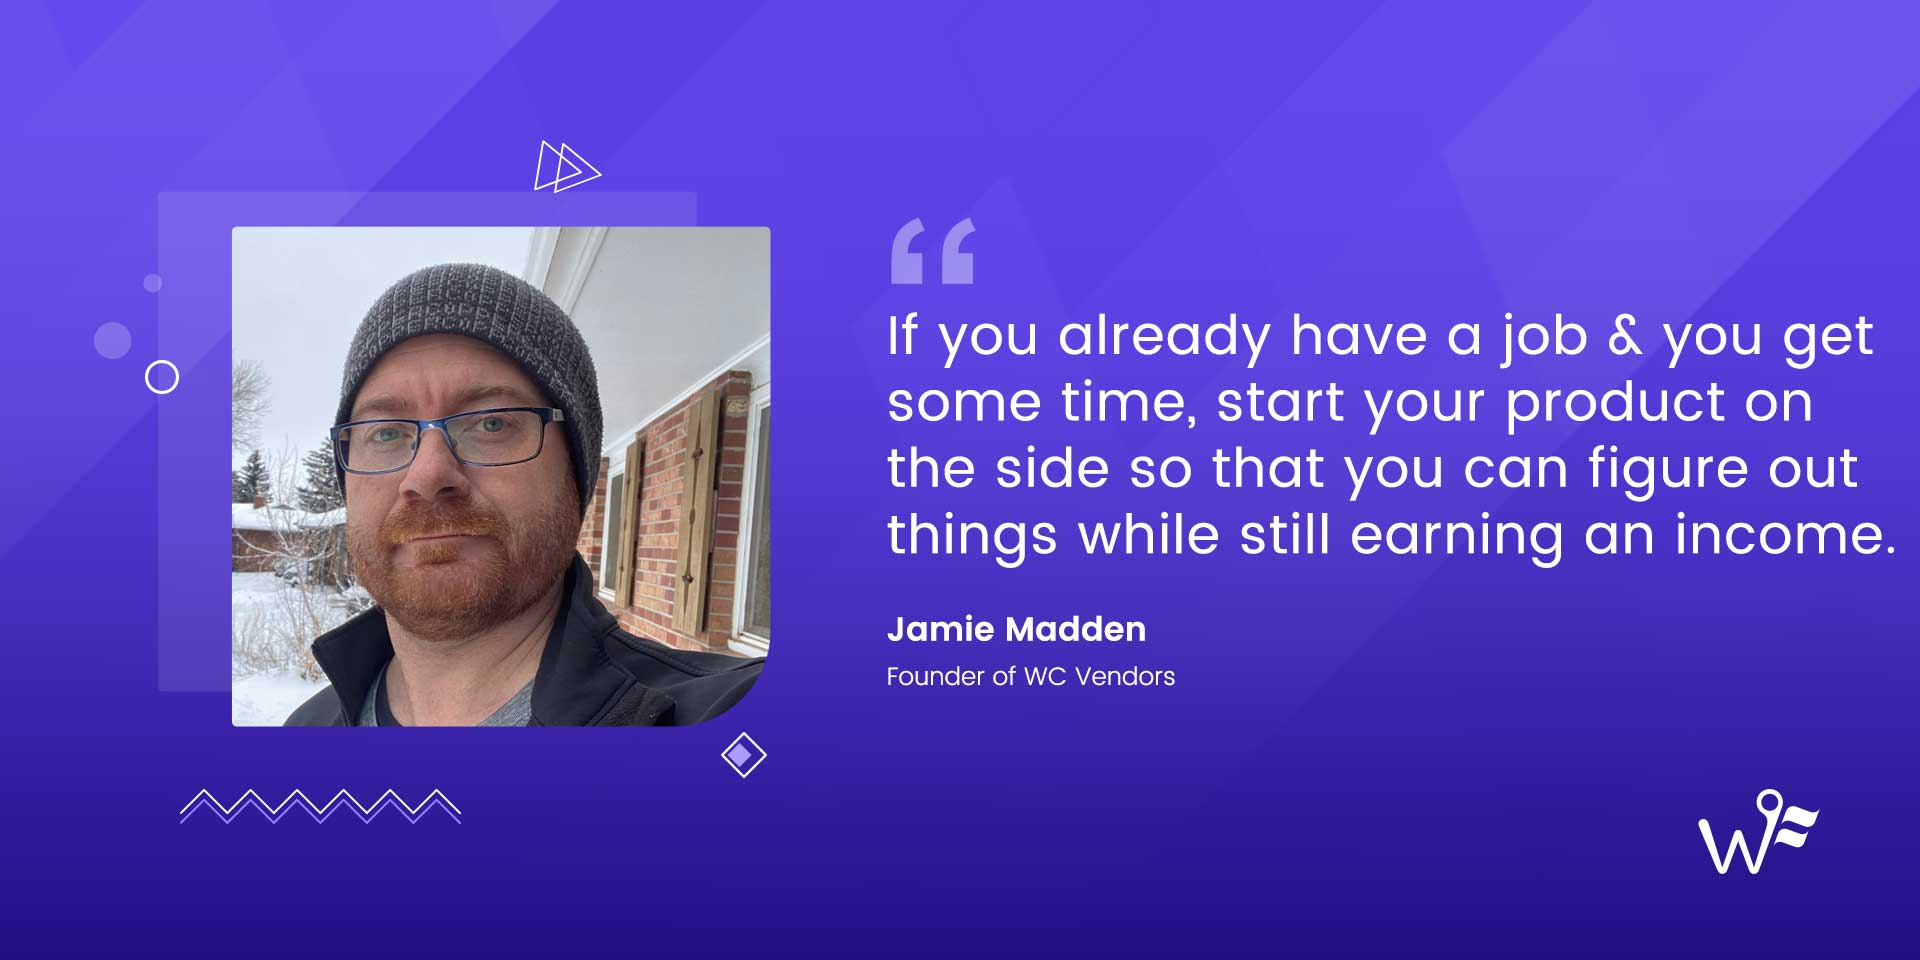 Jamie Madden of WC Vendors